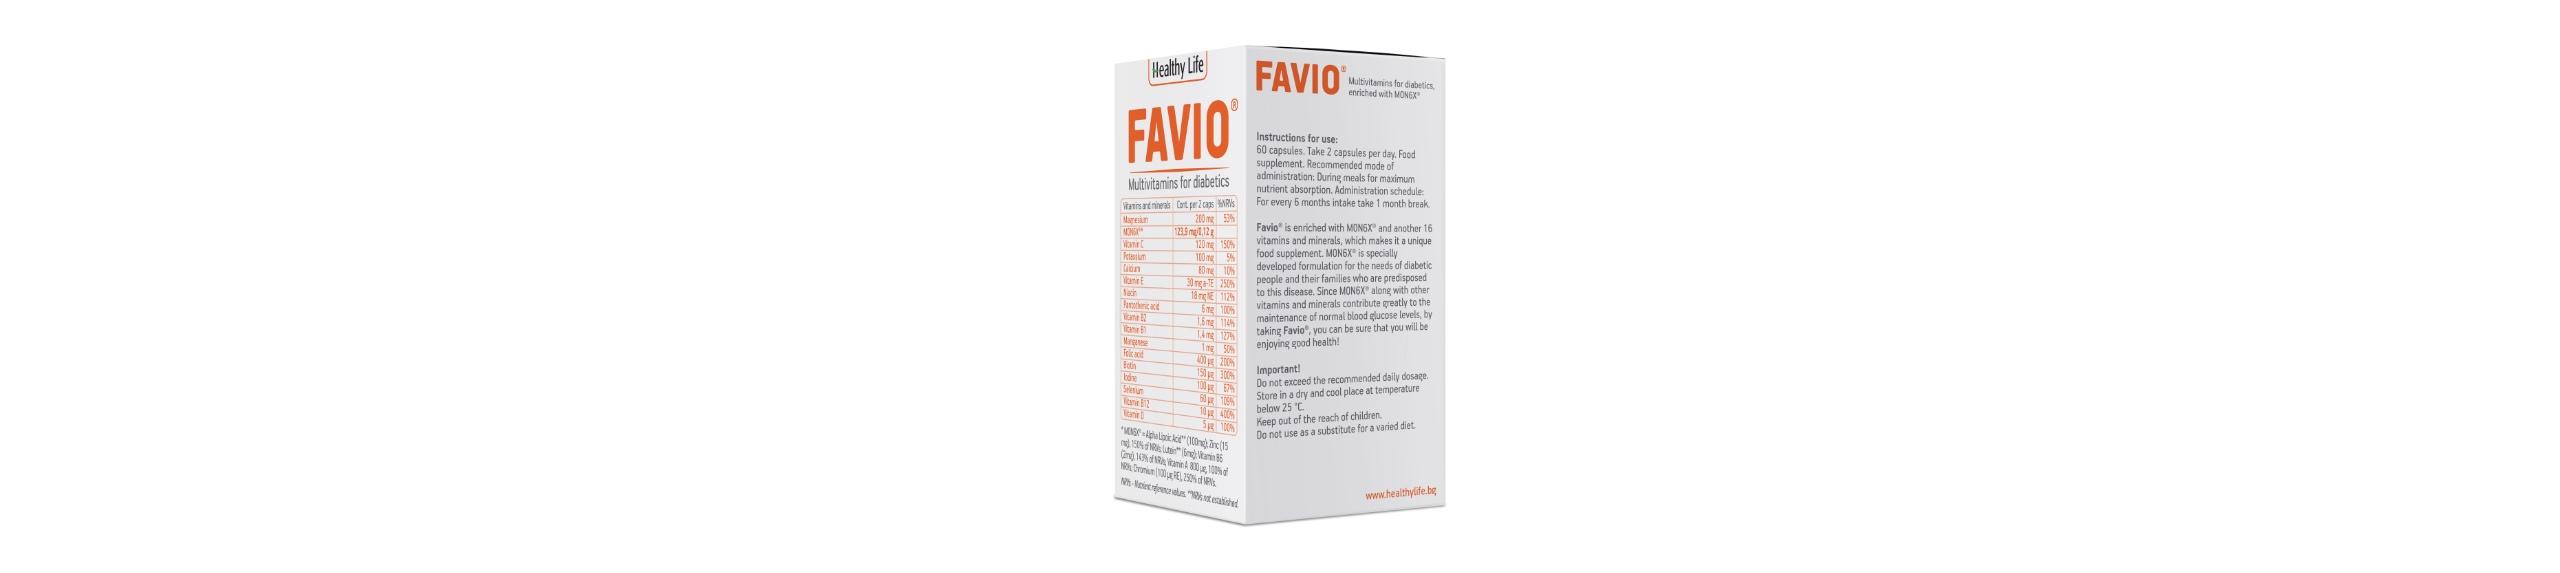 P3-Slider-img-Favio4